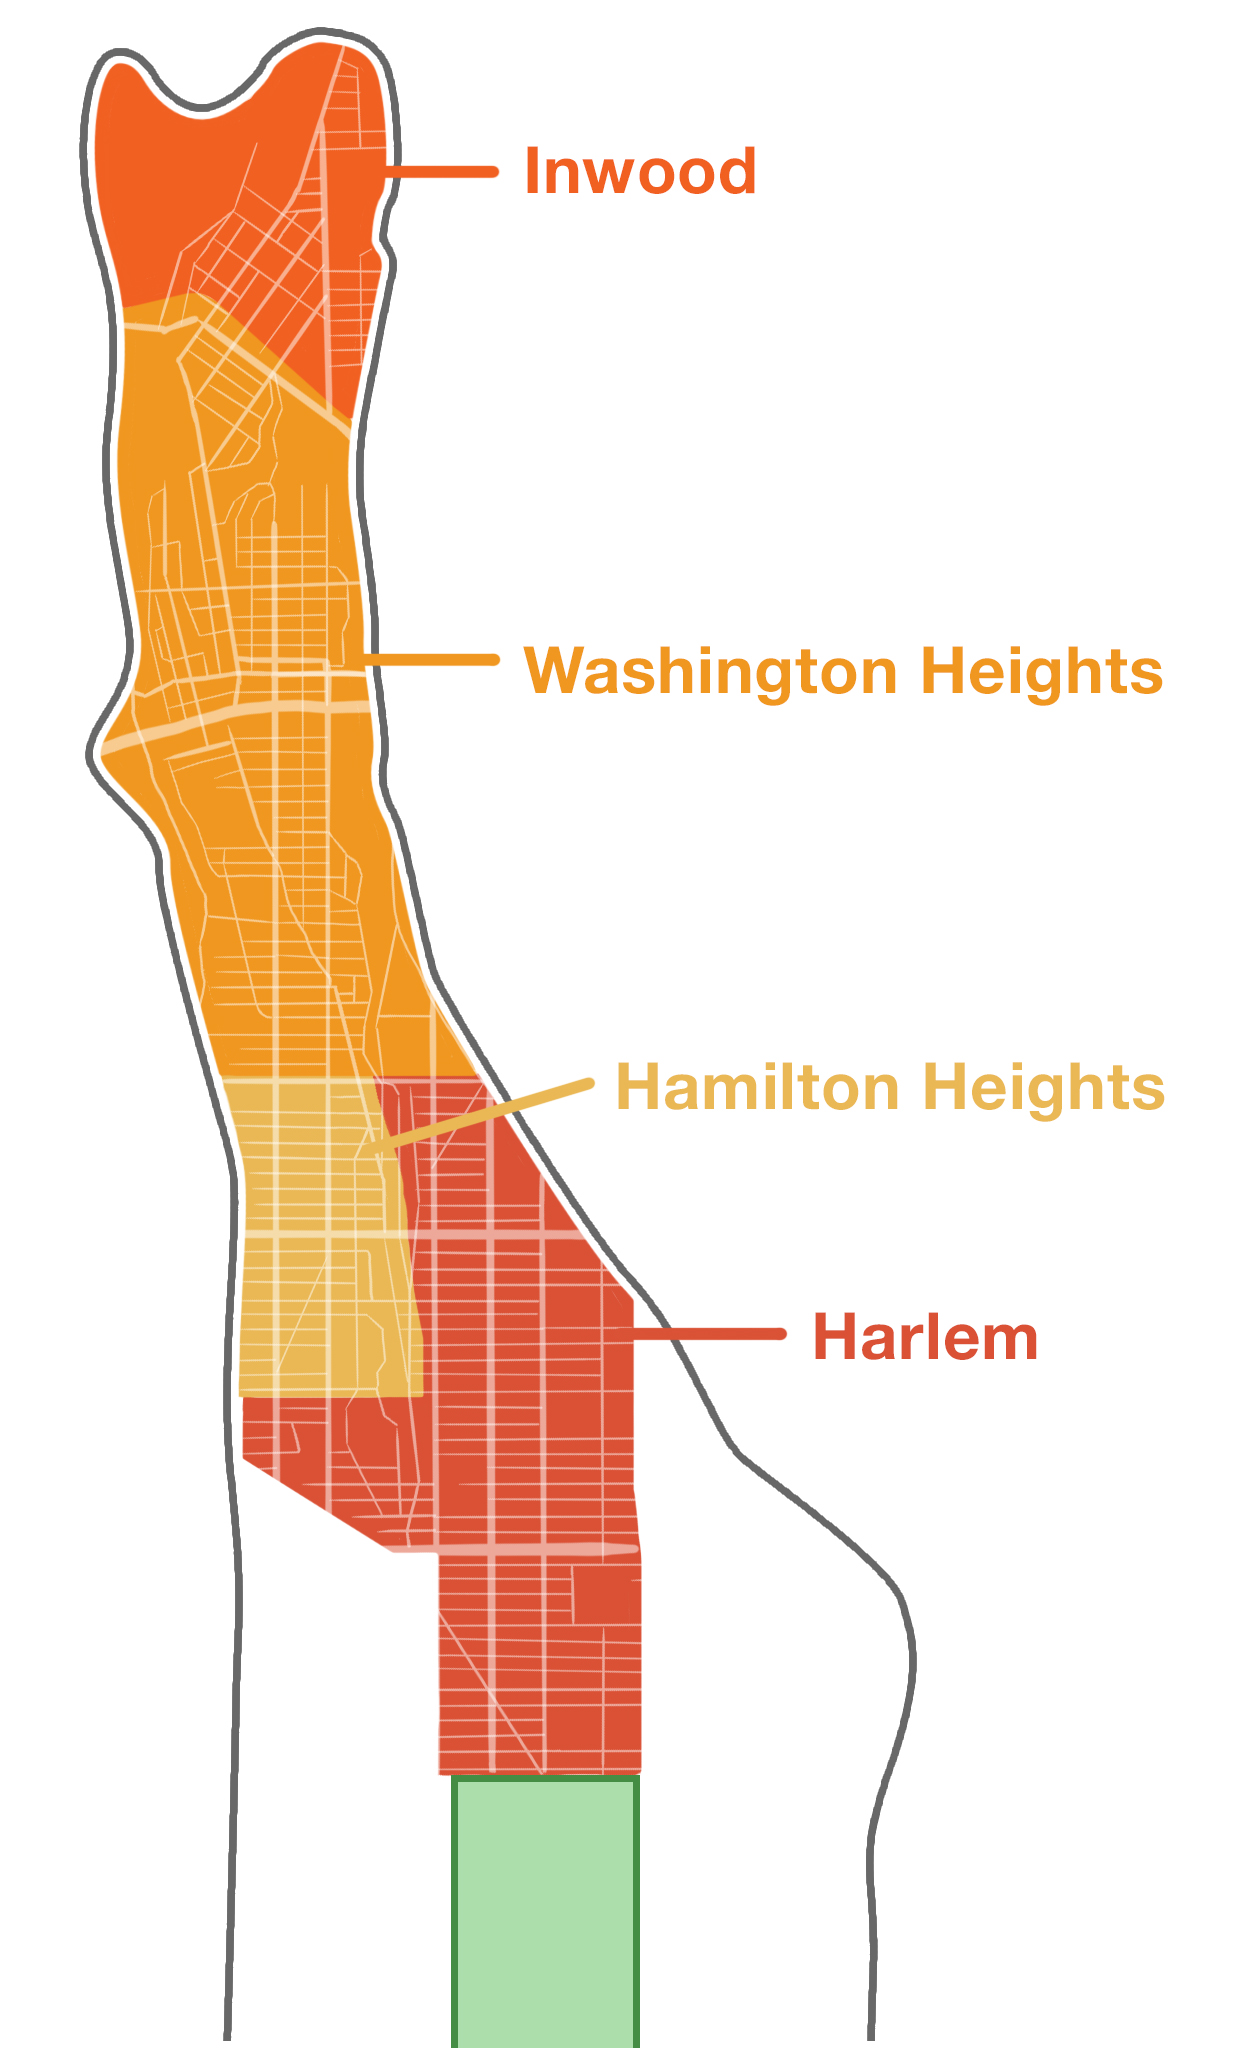 cloth-color-map-neighborhoods2.jpg